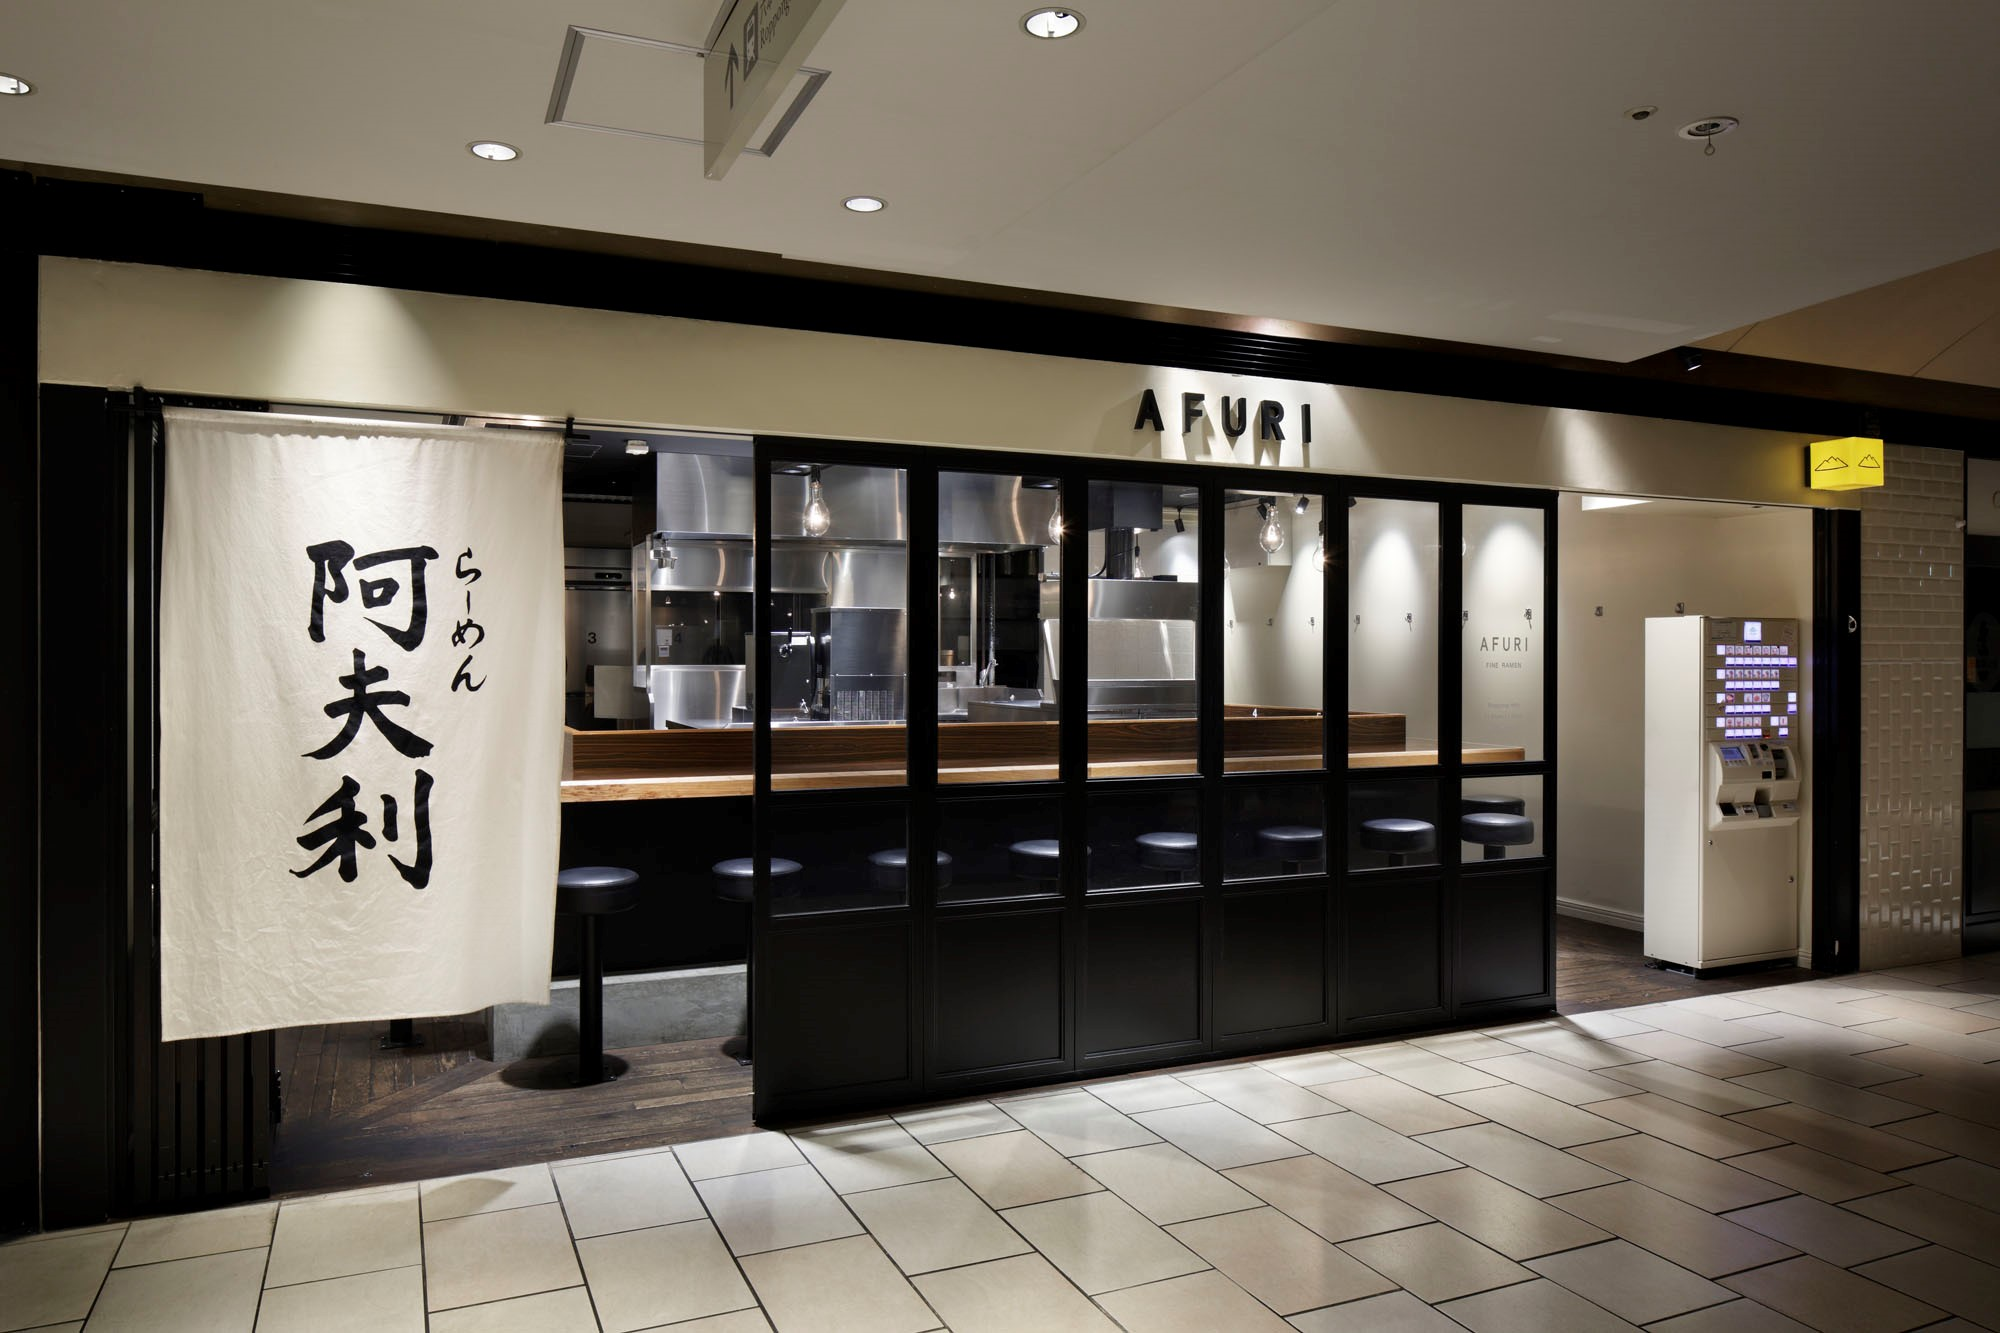 AFURI六本木ヒルズ - Jam Jam